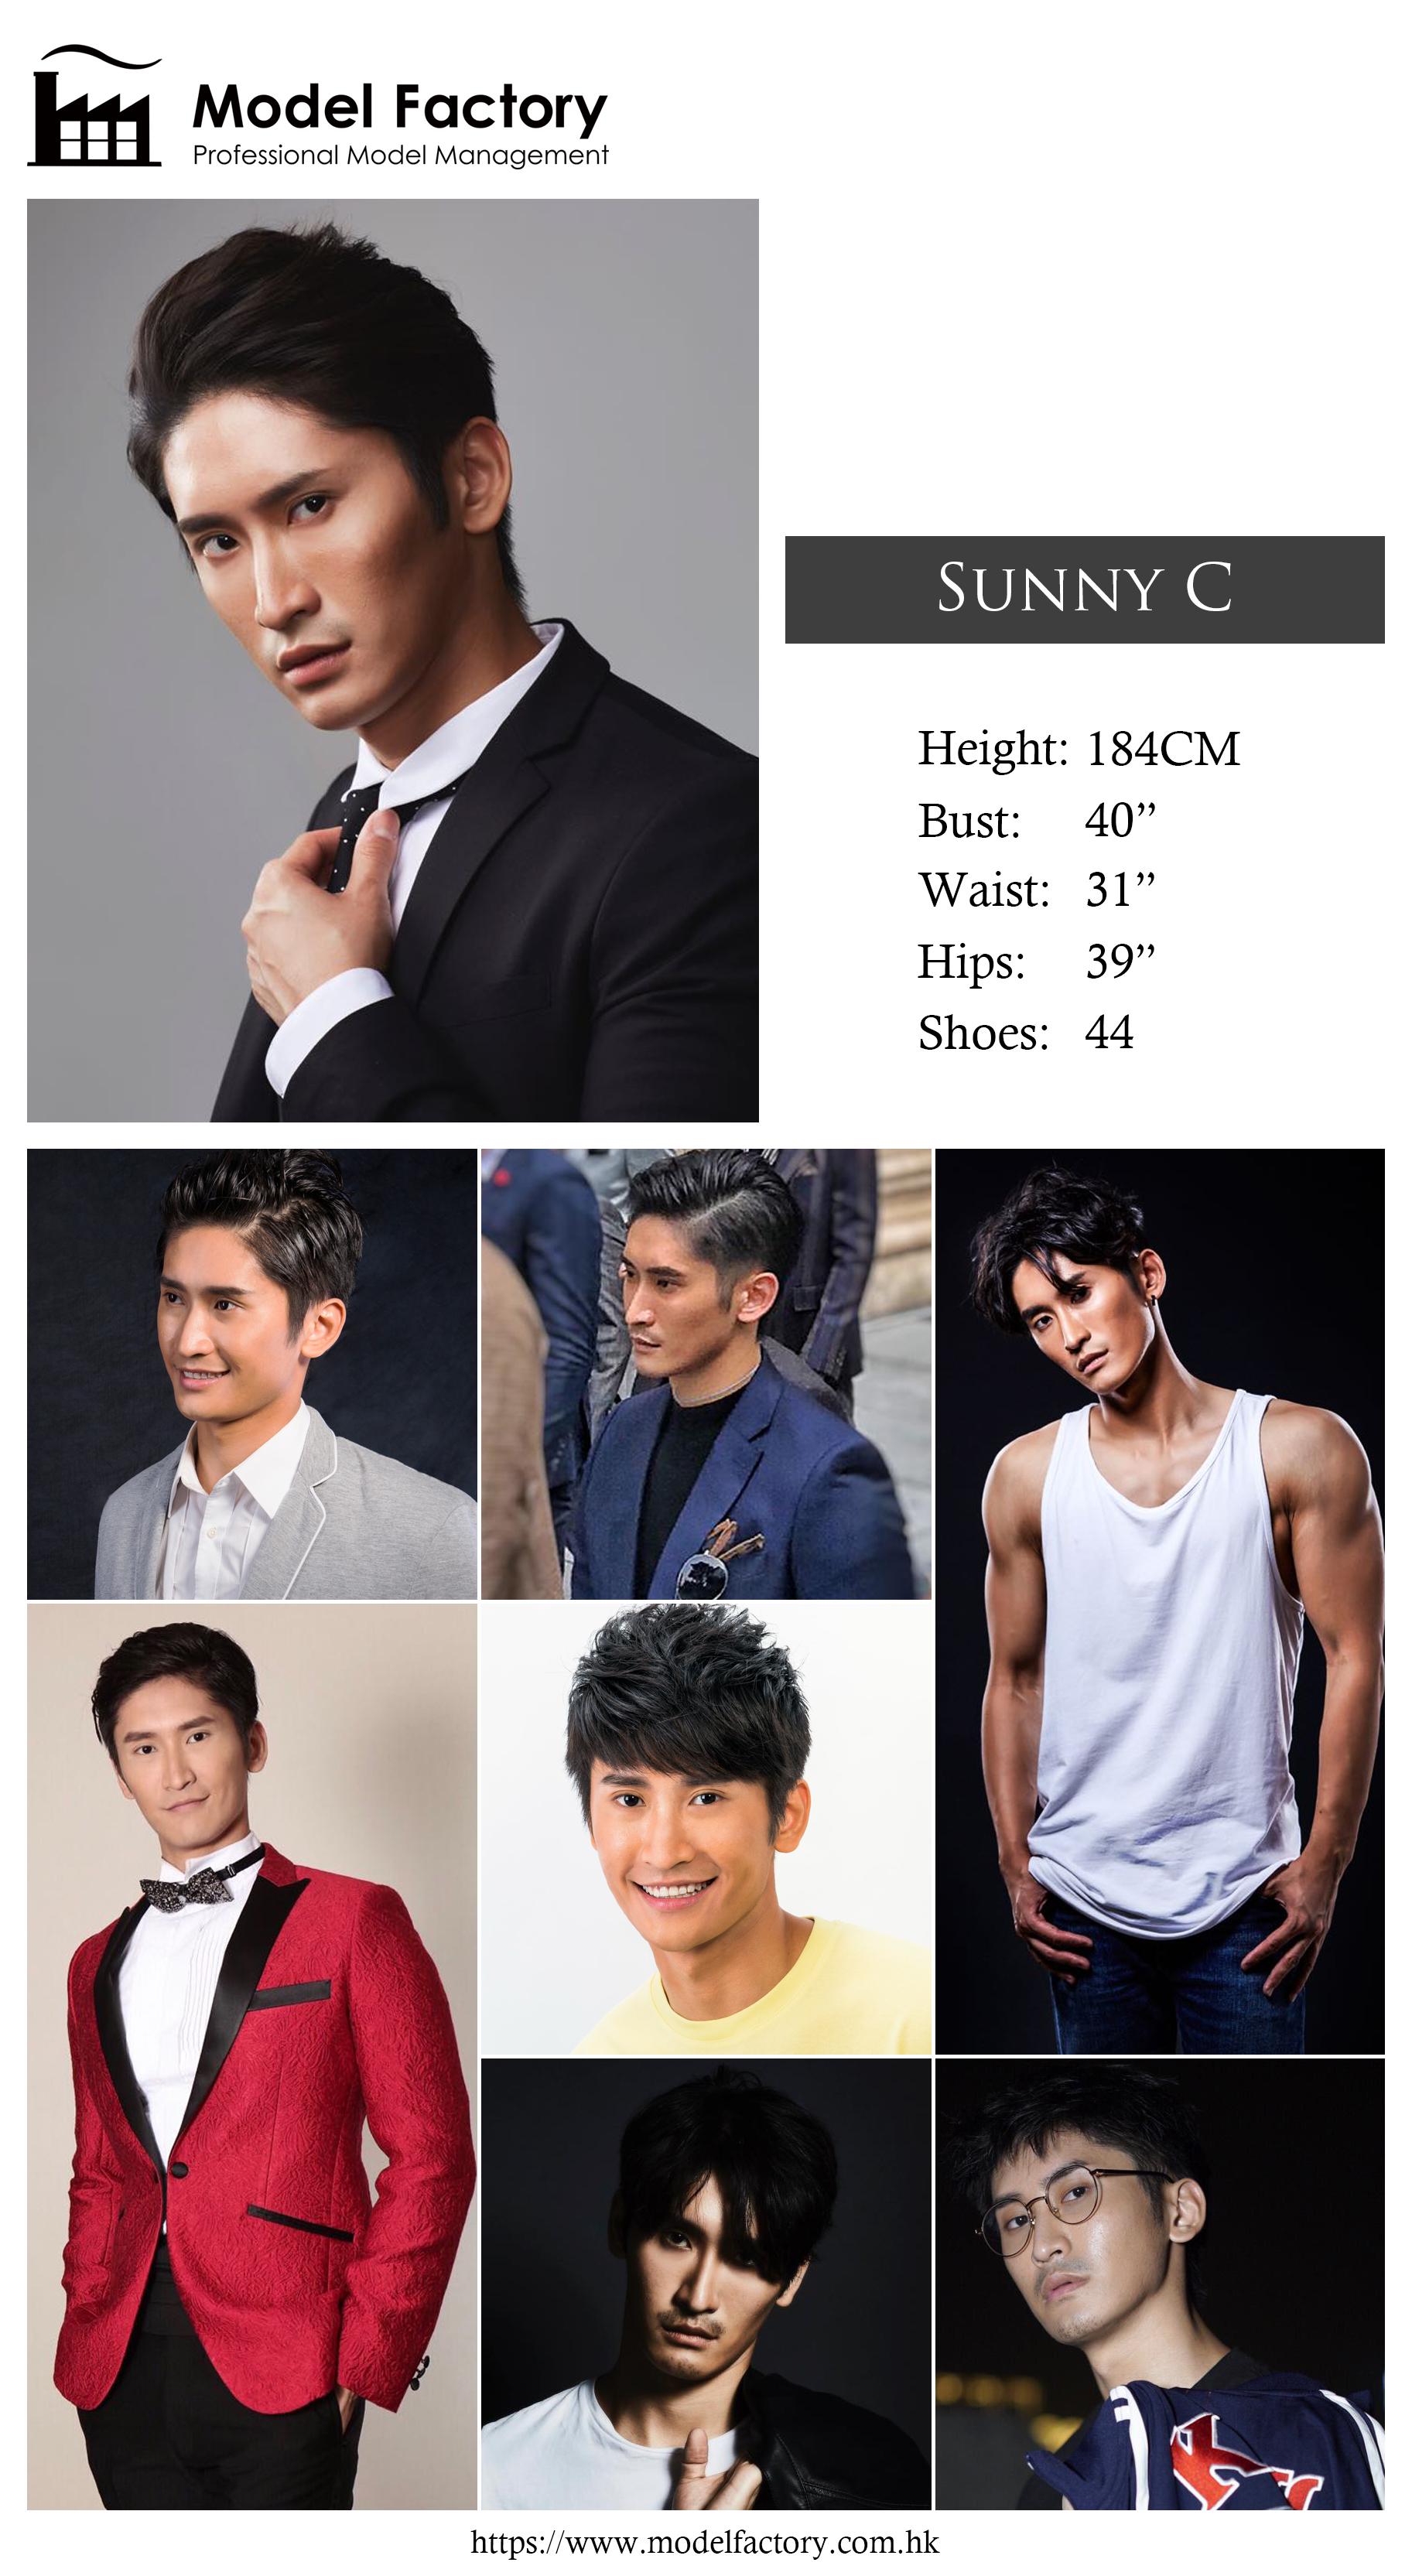 Model Factory Hong Kong Male Model SunnyC